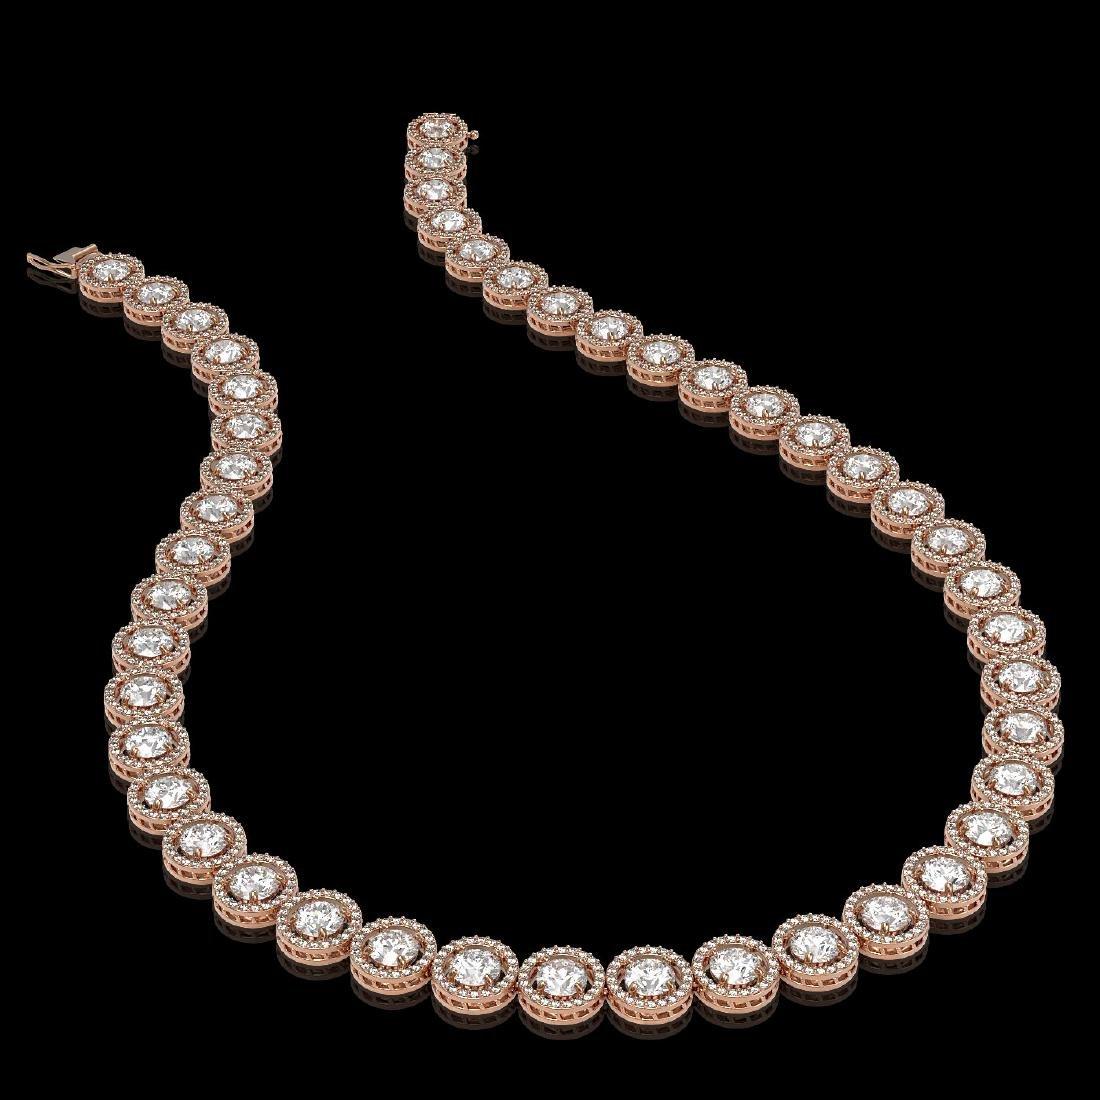 30.78 CTW Diamond Designer Necklace 18K Rose Gold - 2